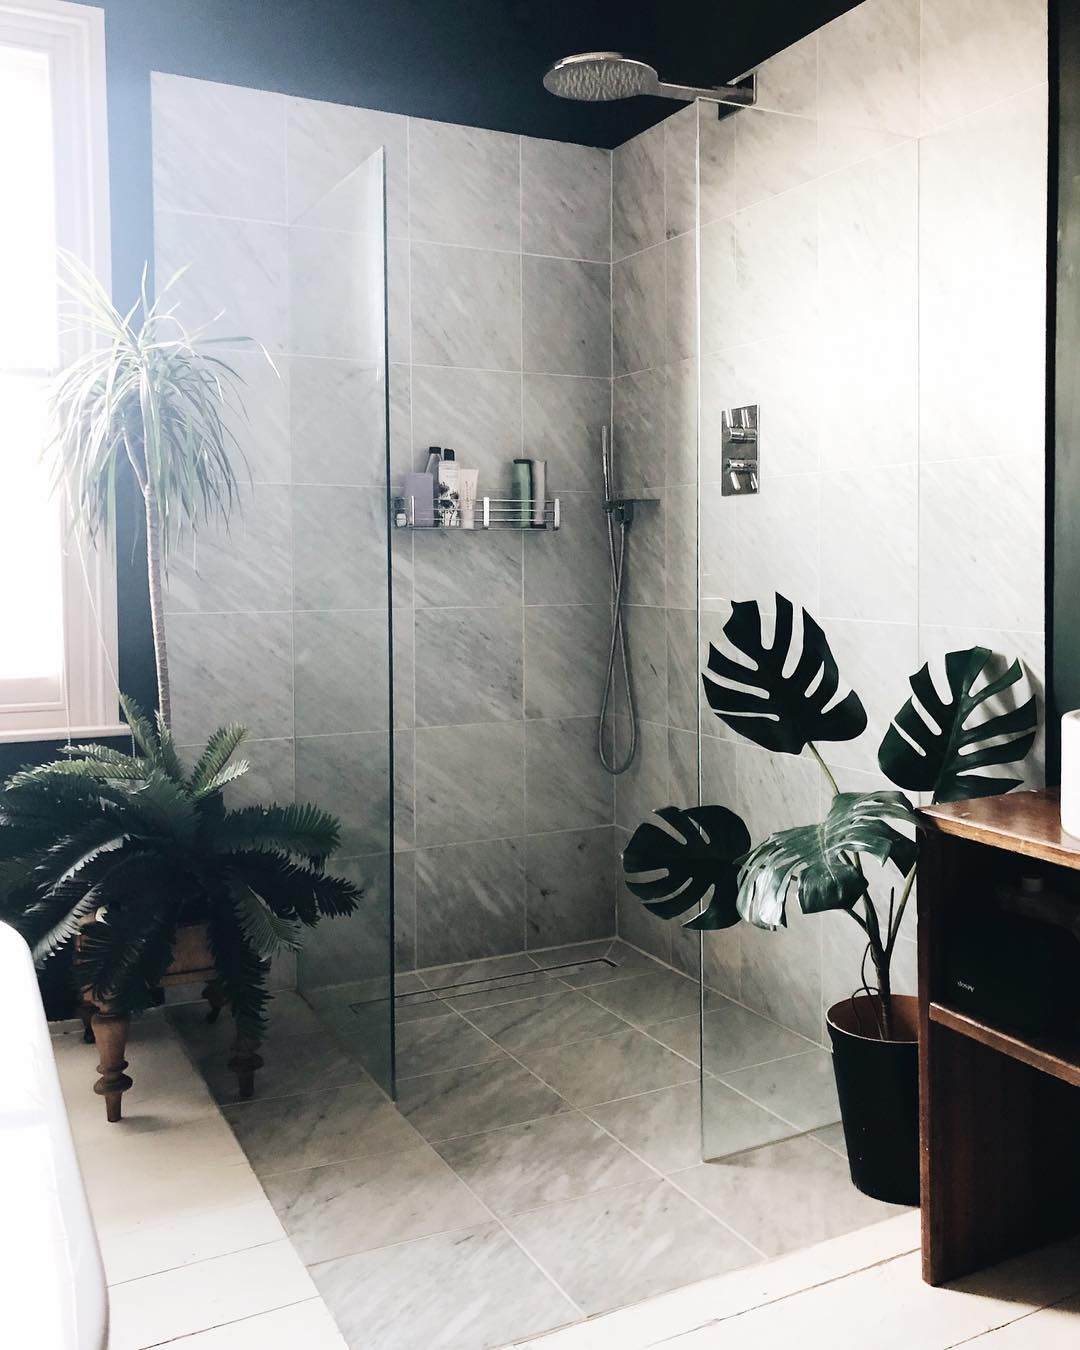 Kate Watson Smyth On Instagram The Final Corner Of The Bathroom